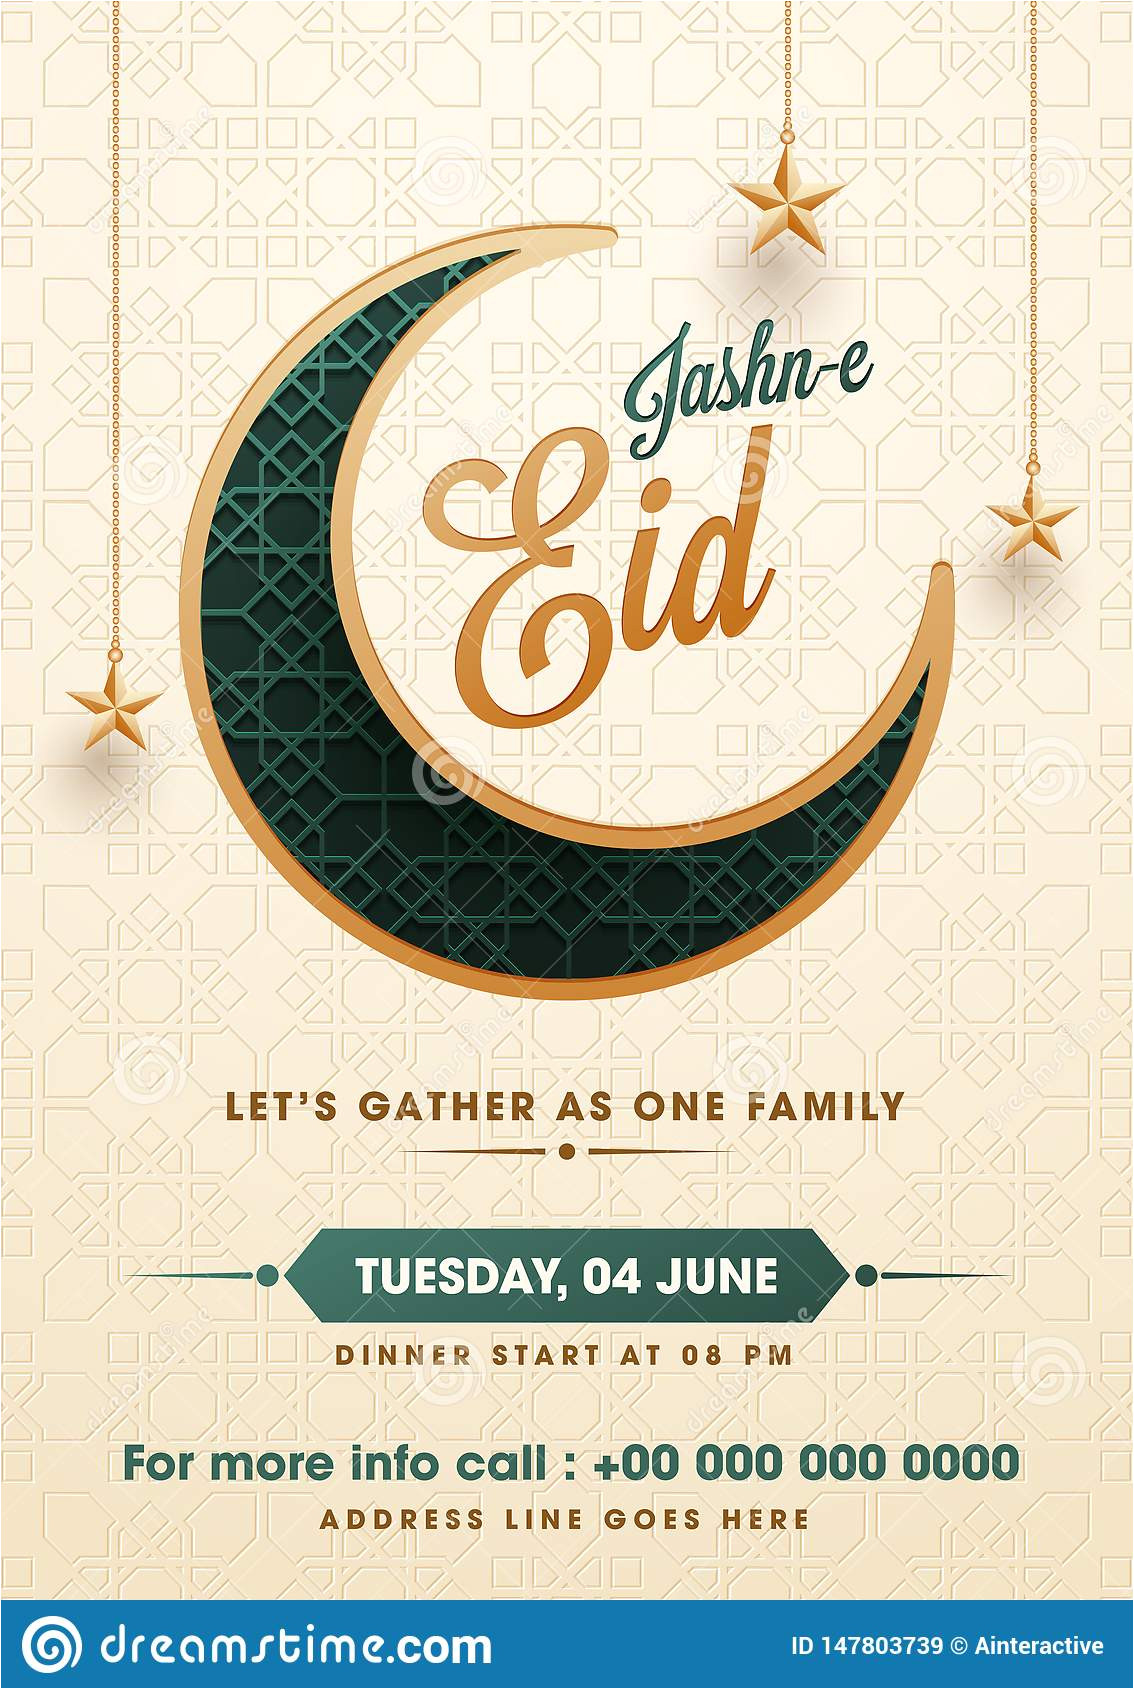 flat style jasne eid party invitation card design illustration crescent moon hanging star islamic pattern flat 147803739 jpg